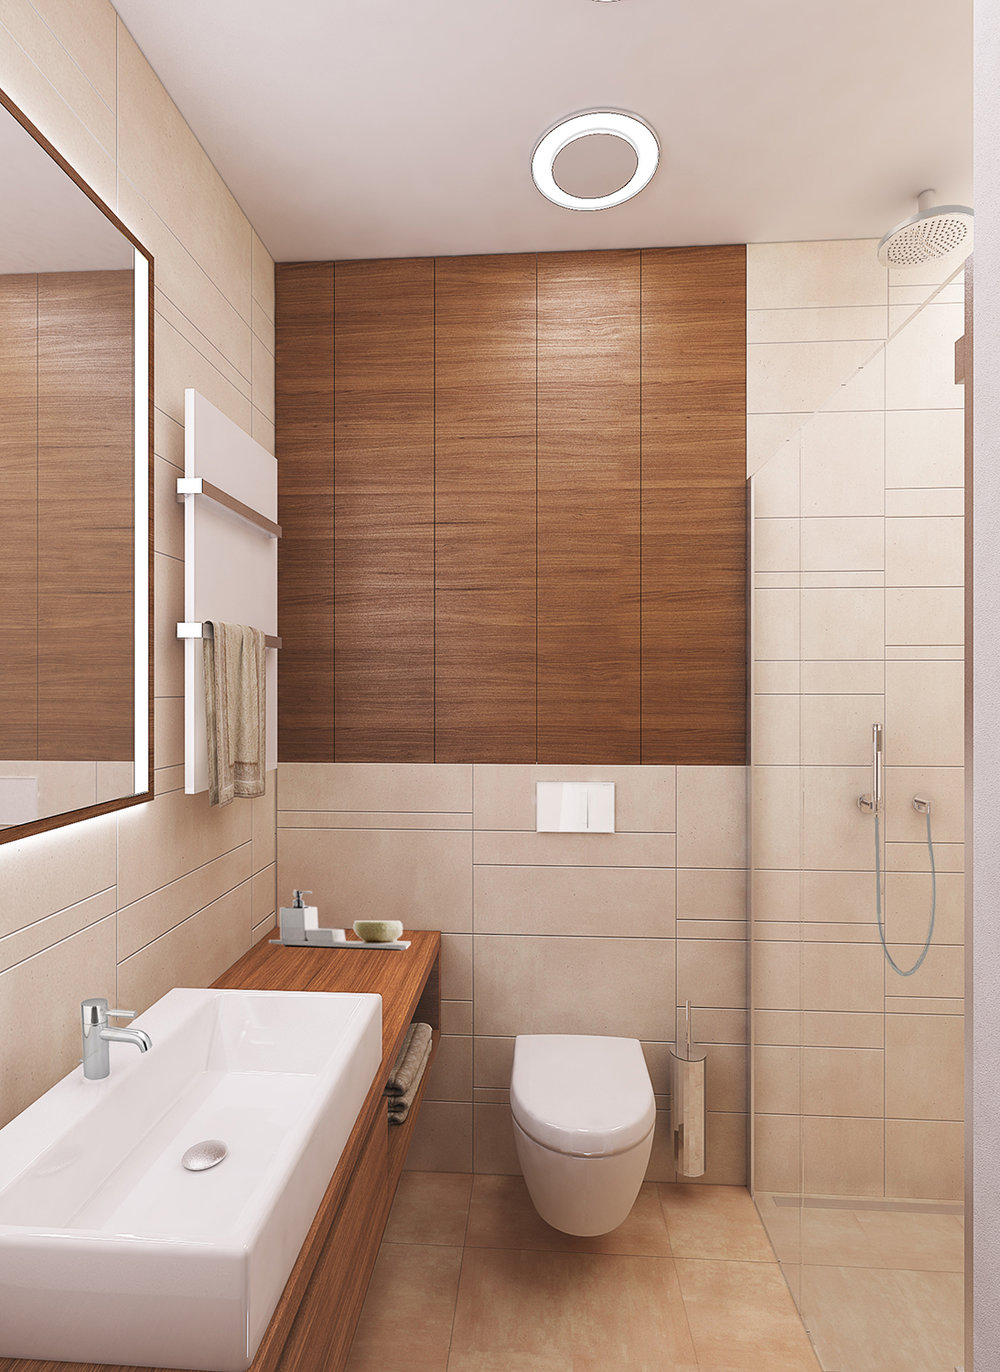 interior-Tina Rugelj_AP G_kopalnica-bathroom_02.jpg